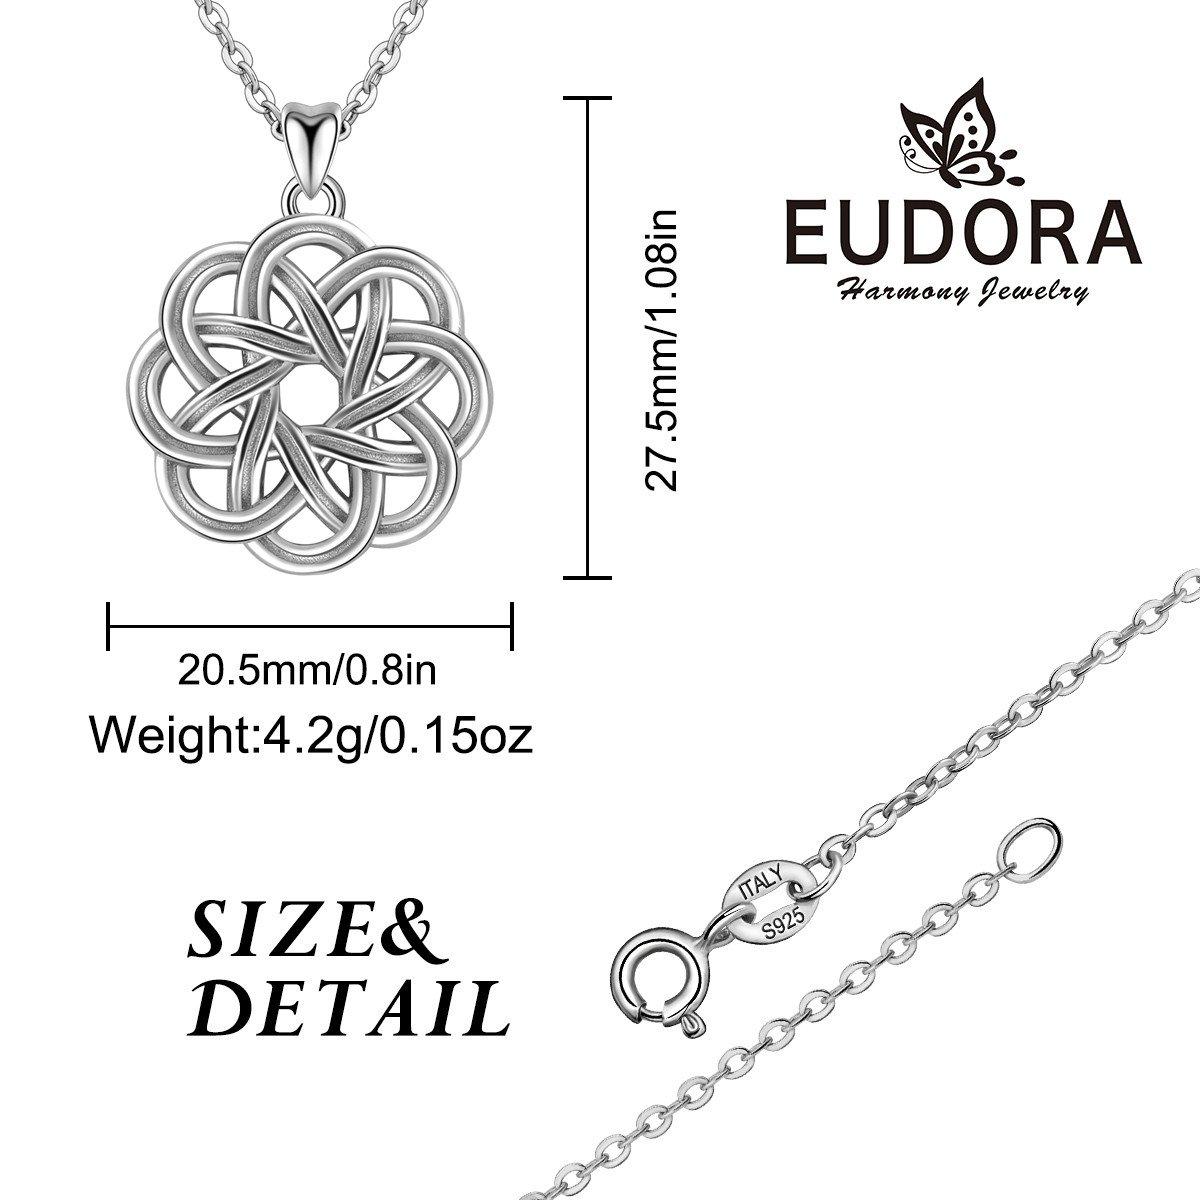 EUDORA Retro 925 Sterling Silver Irish Lucky Celtic Knot Pendant Necklace for Women, 18 Chain 18 Chain CYD176-CYB001-NL41-18